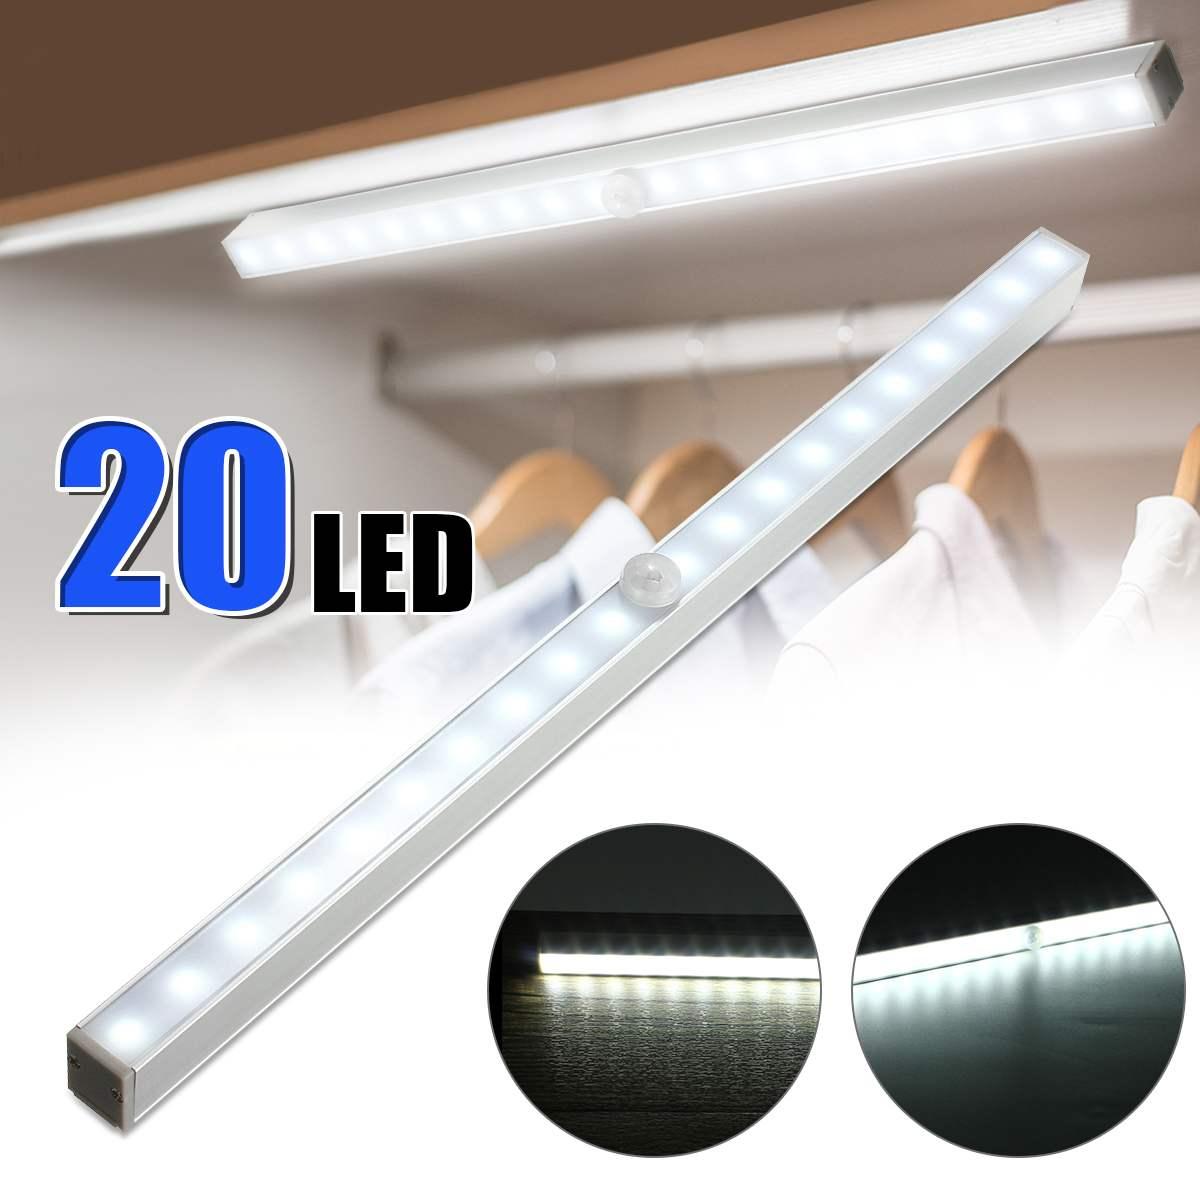 LED Under Cabinet Light 20 LEDs PIR Motion Sensor Battery Power Cabinet Drawer Light Closet Cabinet Lamp Night Light LED Lamps